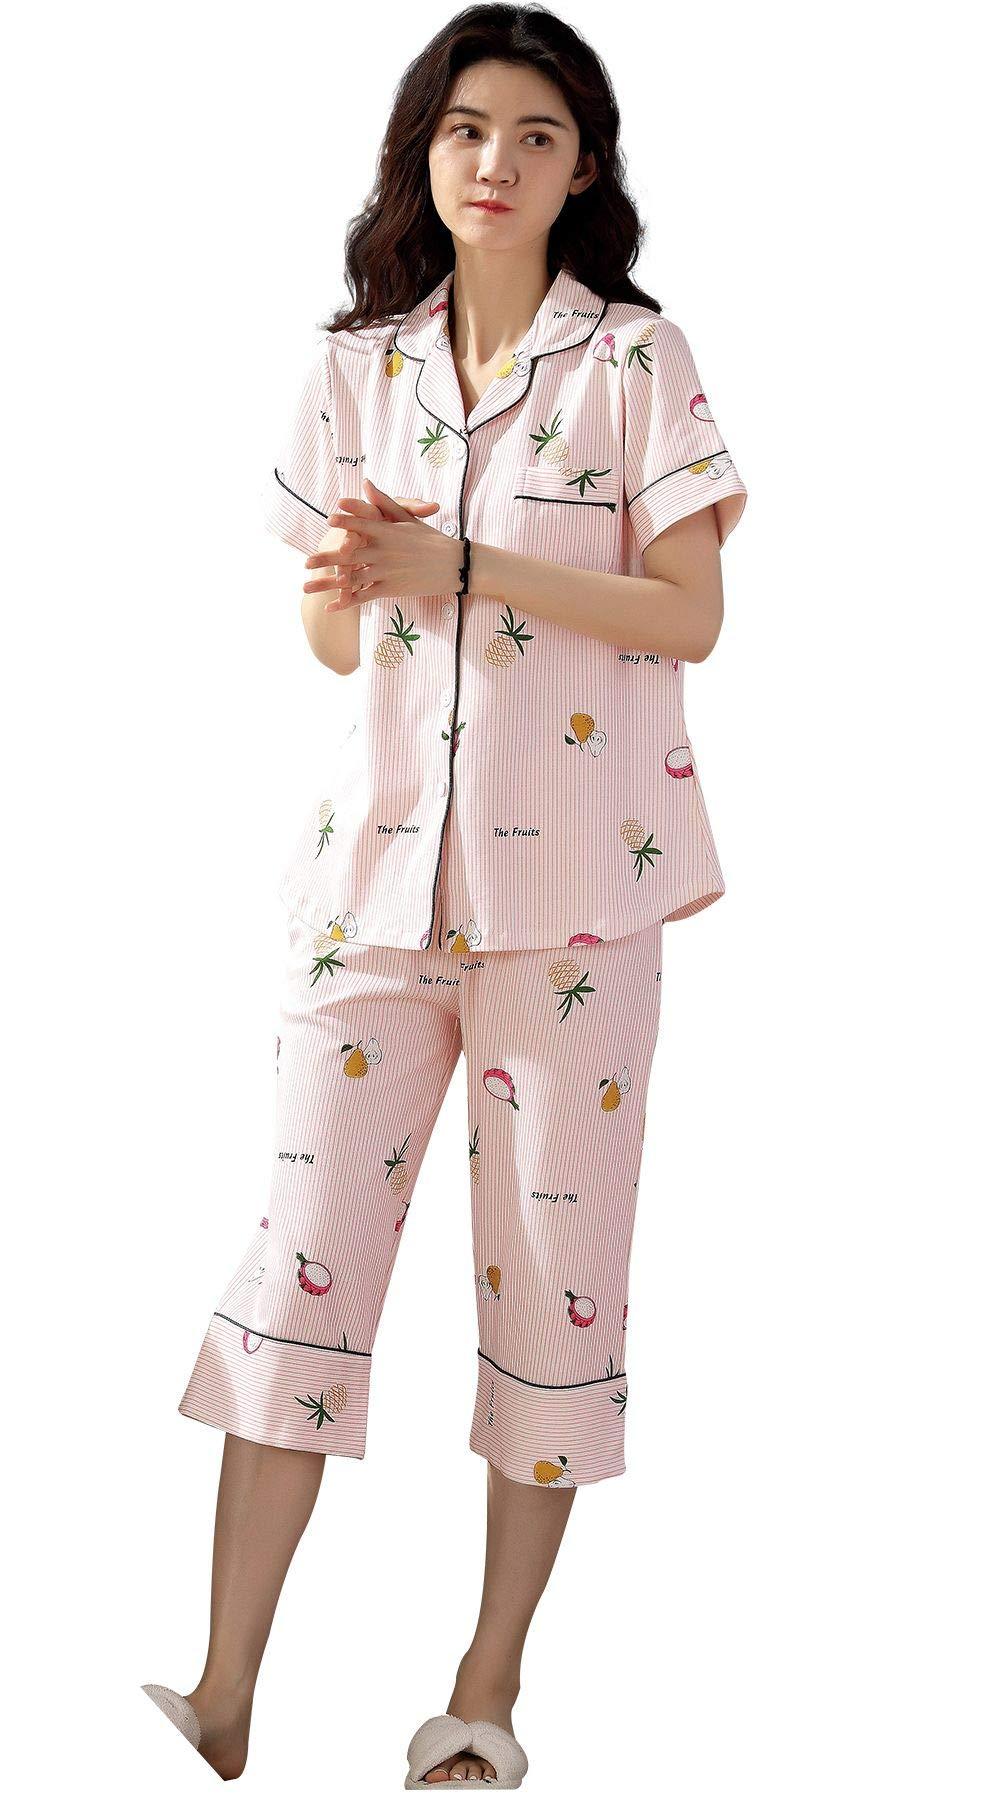 Pajamas for Women Two Piece Capri Pajama Sets Striped Sleepwear Soft Pjs Lounge Sets